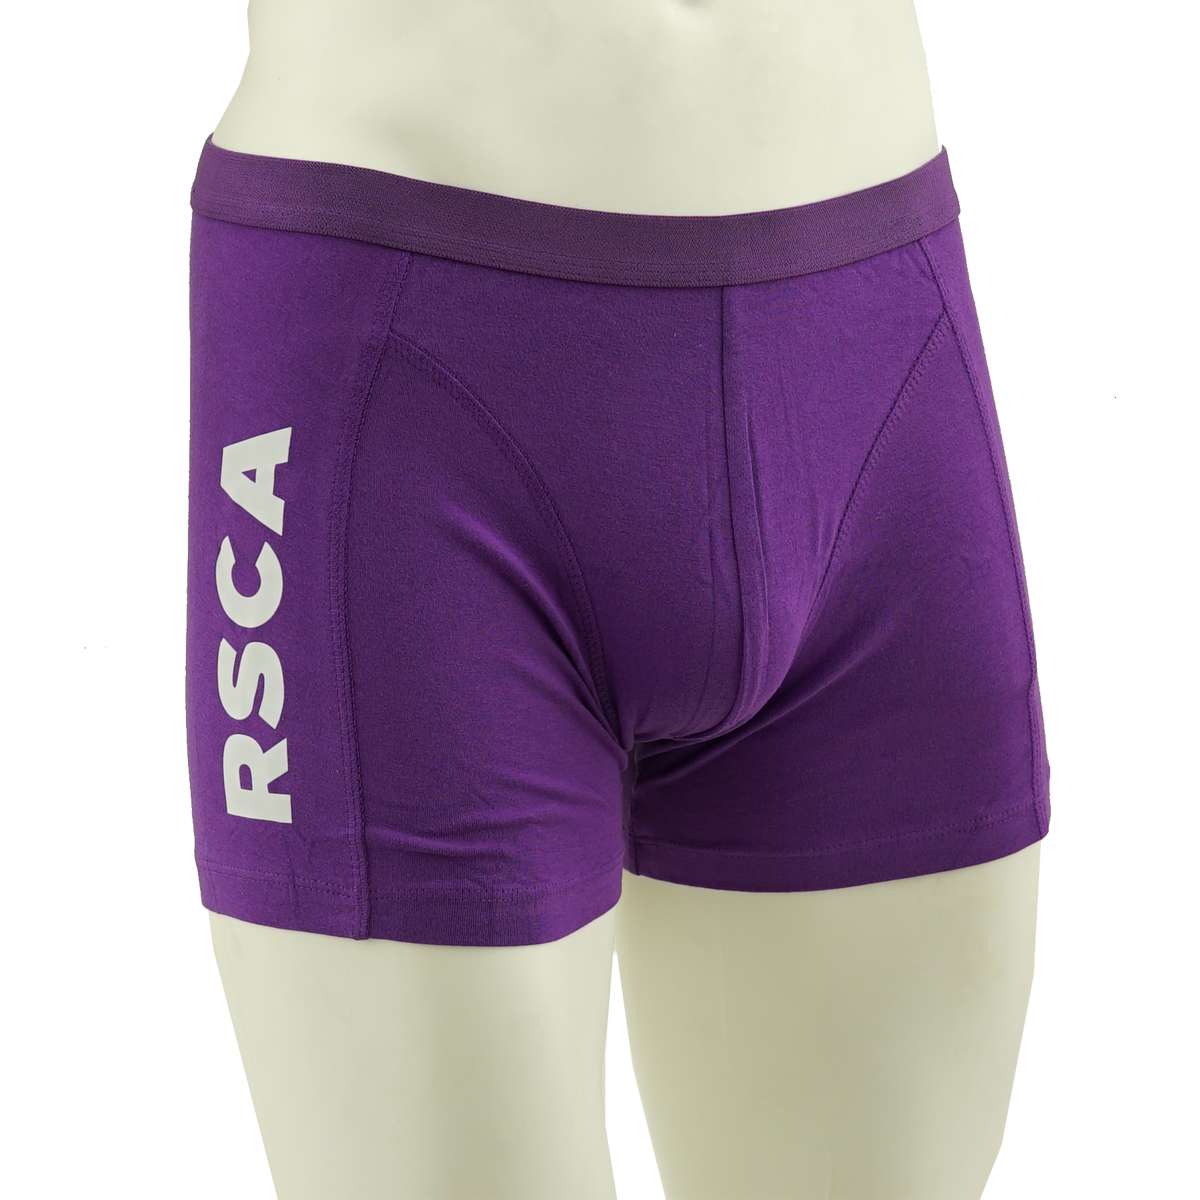 RSCA Boxershort Set Heren